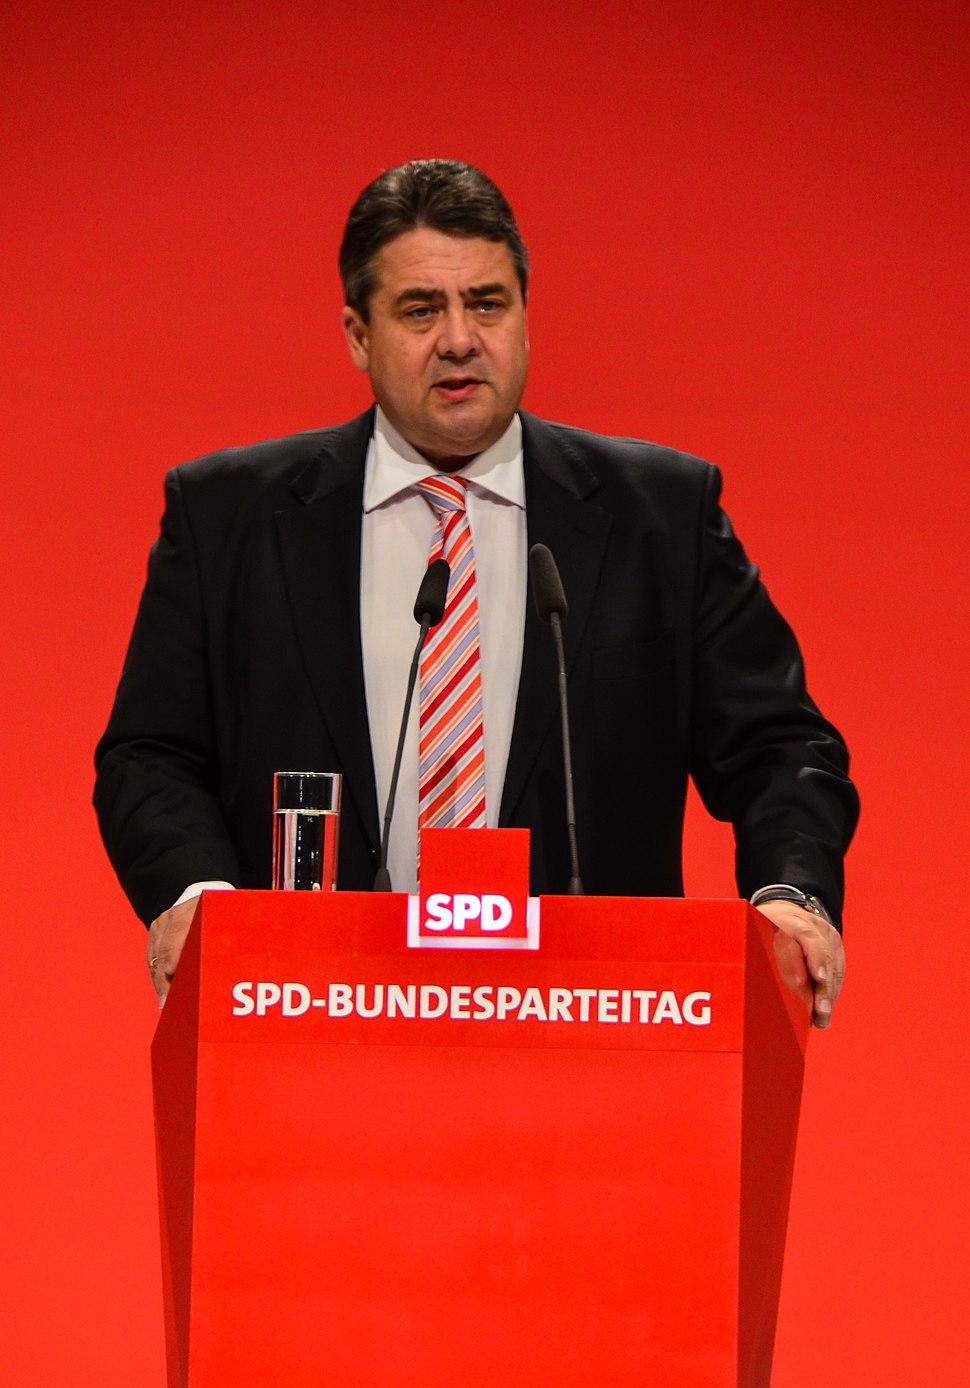 SPD Bundesparteitag Leipzig 2013 by Moritz Kosinsky 021